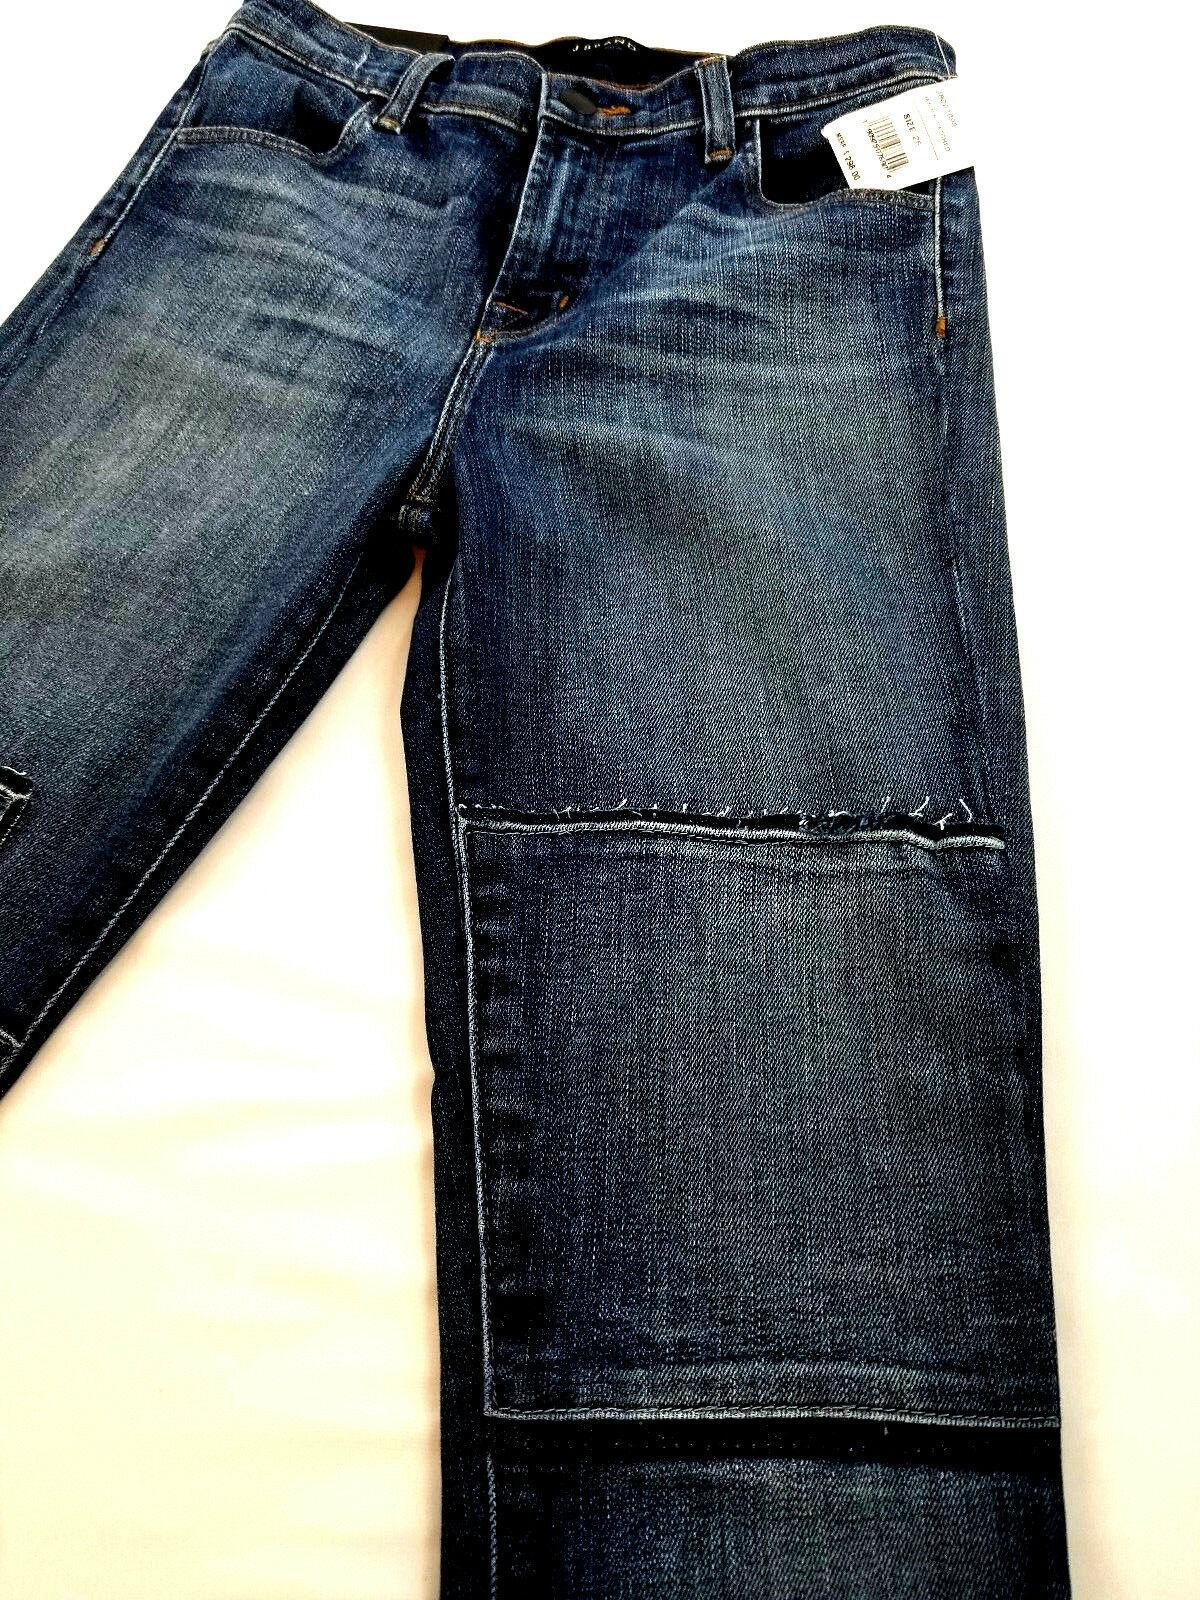 new J BRAND women jeans Jasper Patched JB001098 high rise crop 26 blue MSRP $298 image 8